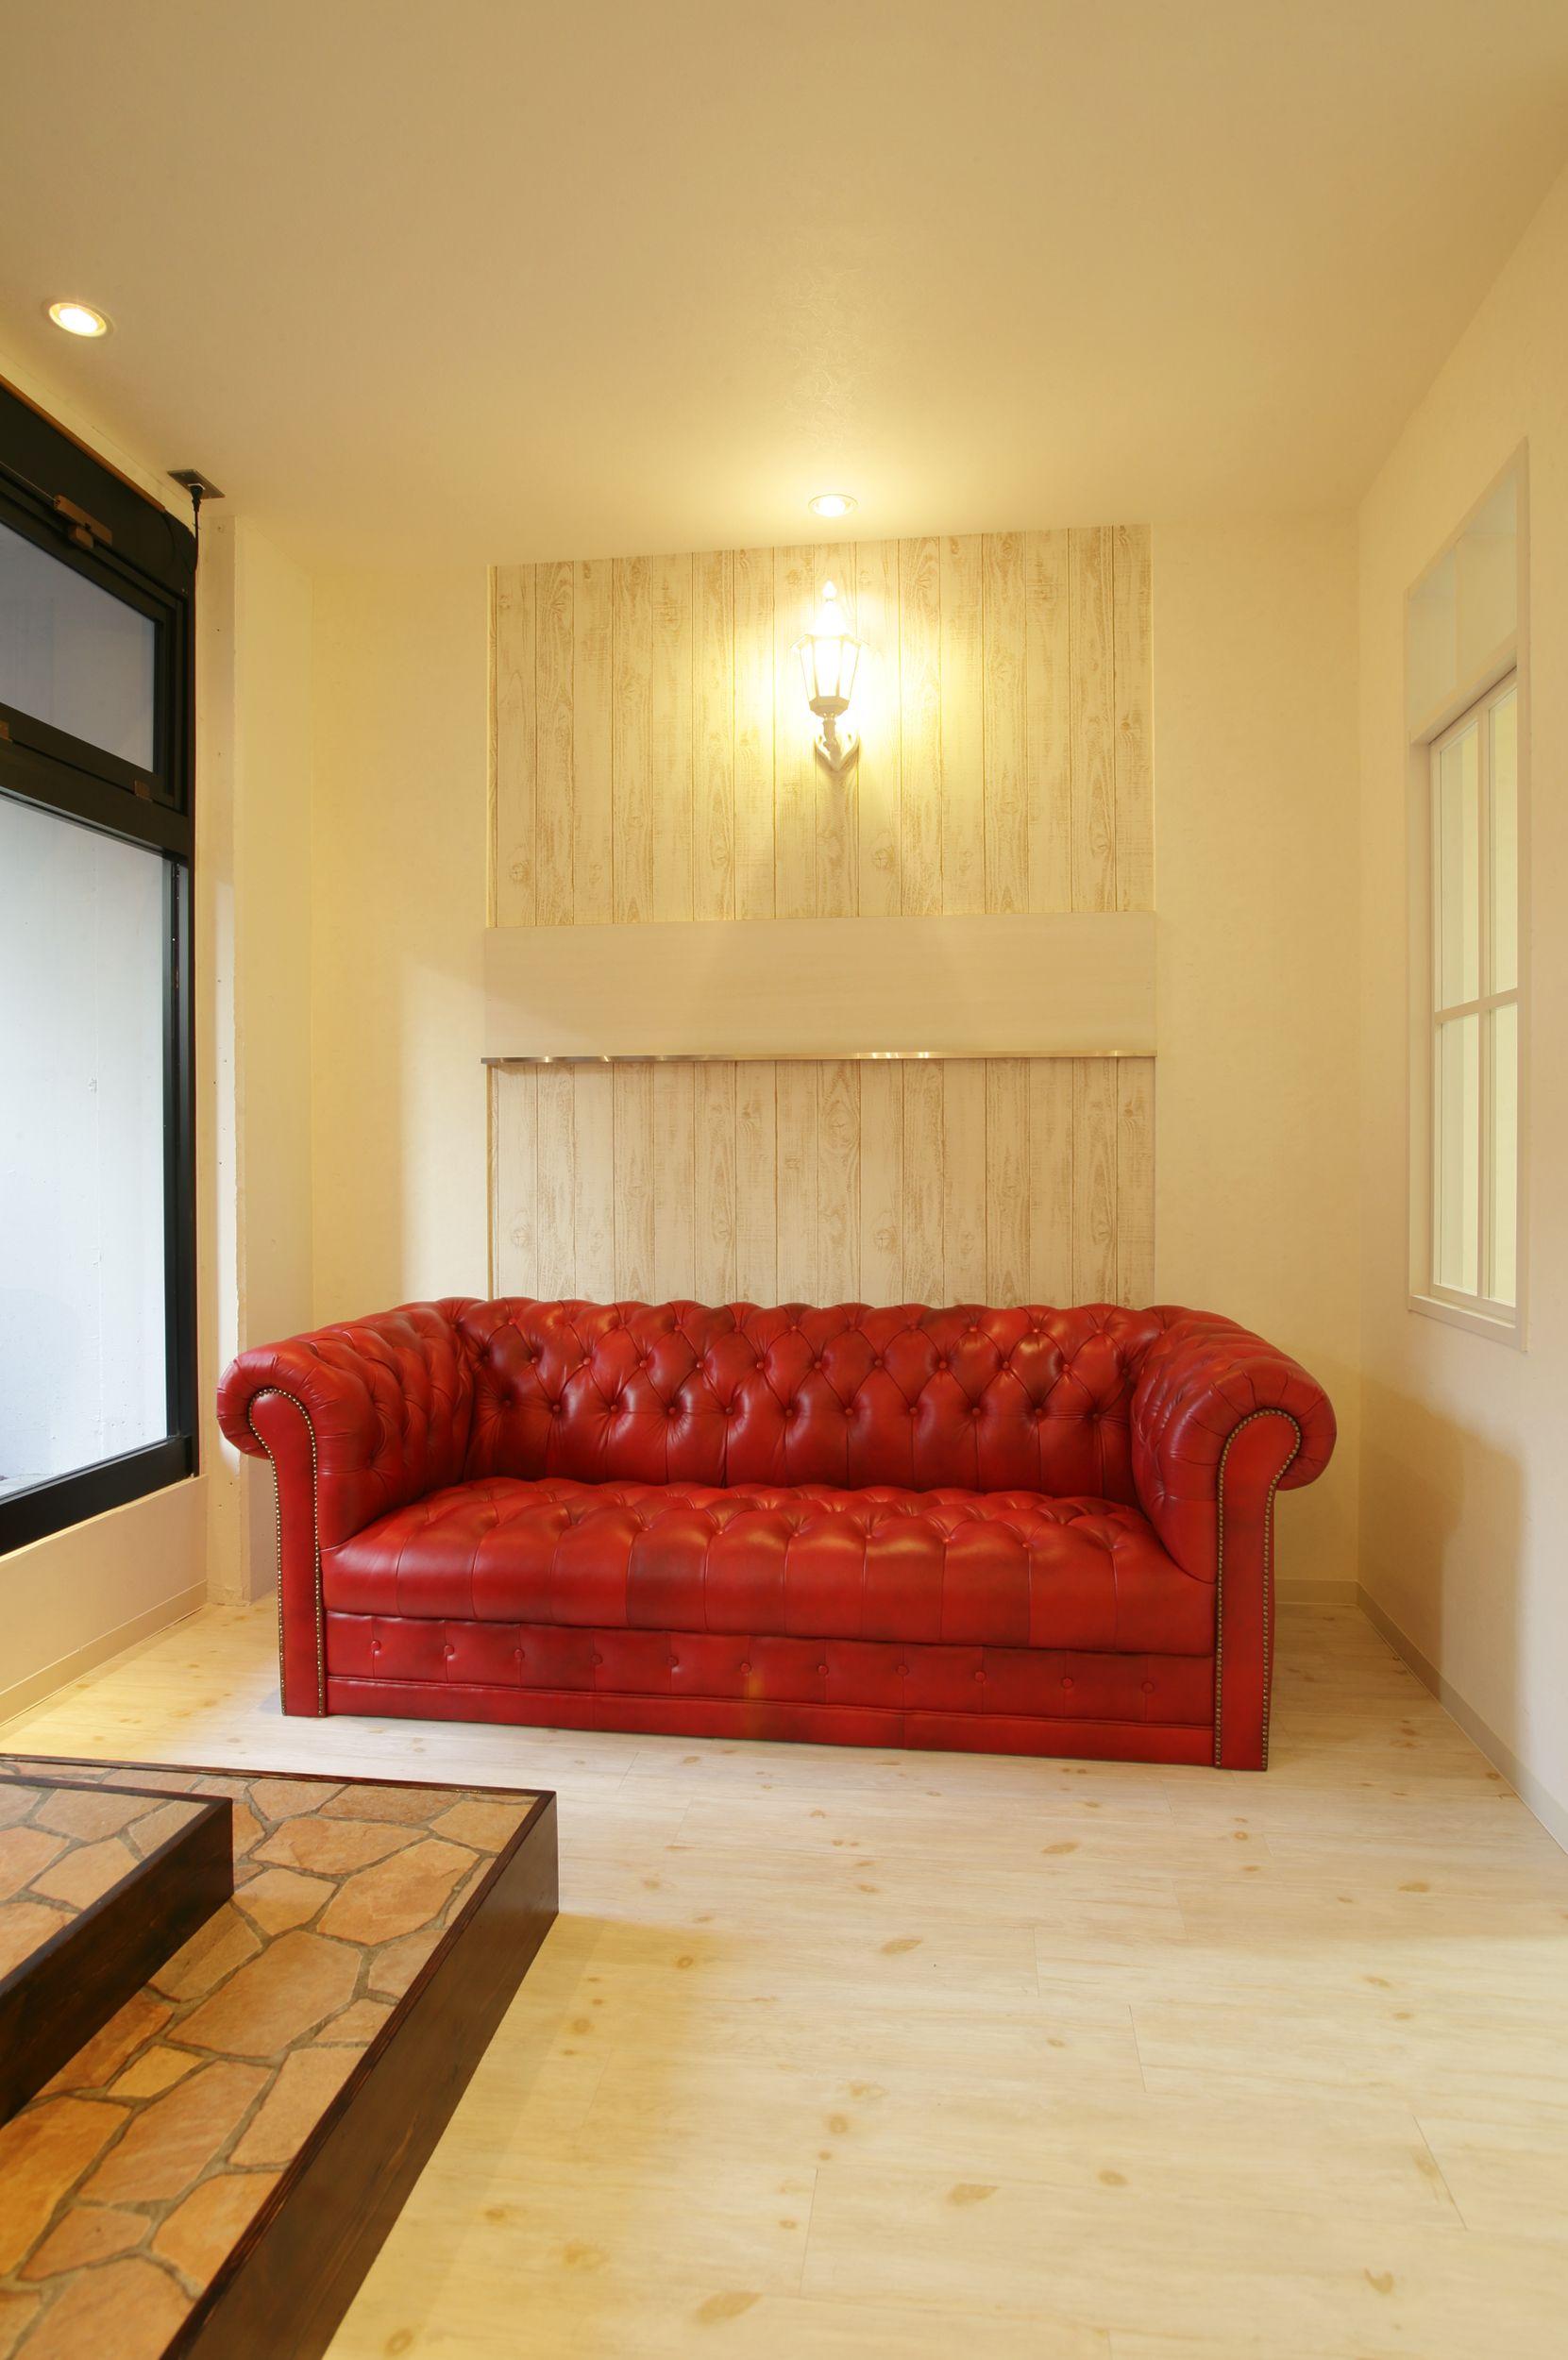 Beauty Salon Interior Design Ideas Red Sofa E Decor Reception Antique French Designs Follow Us On Https Www Facebook Tracksgroup